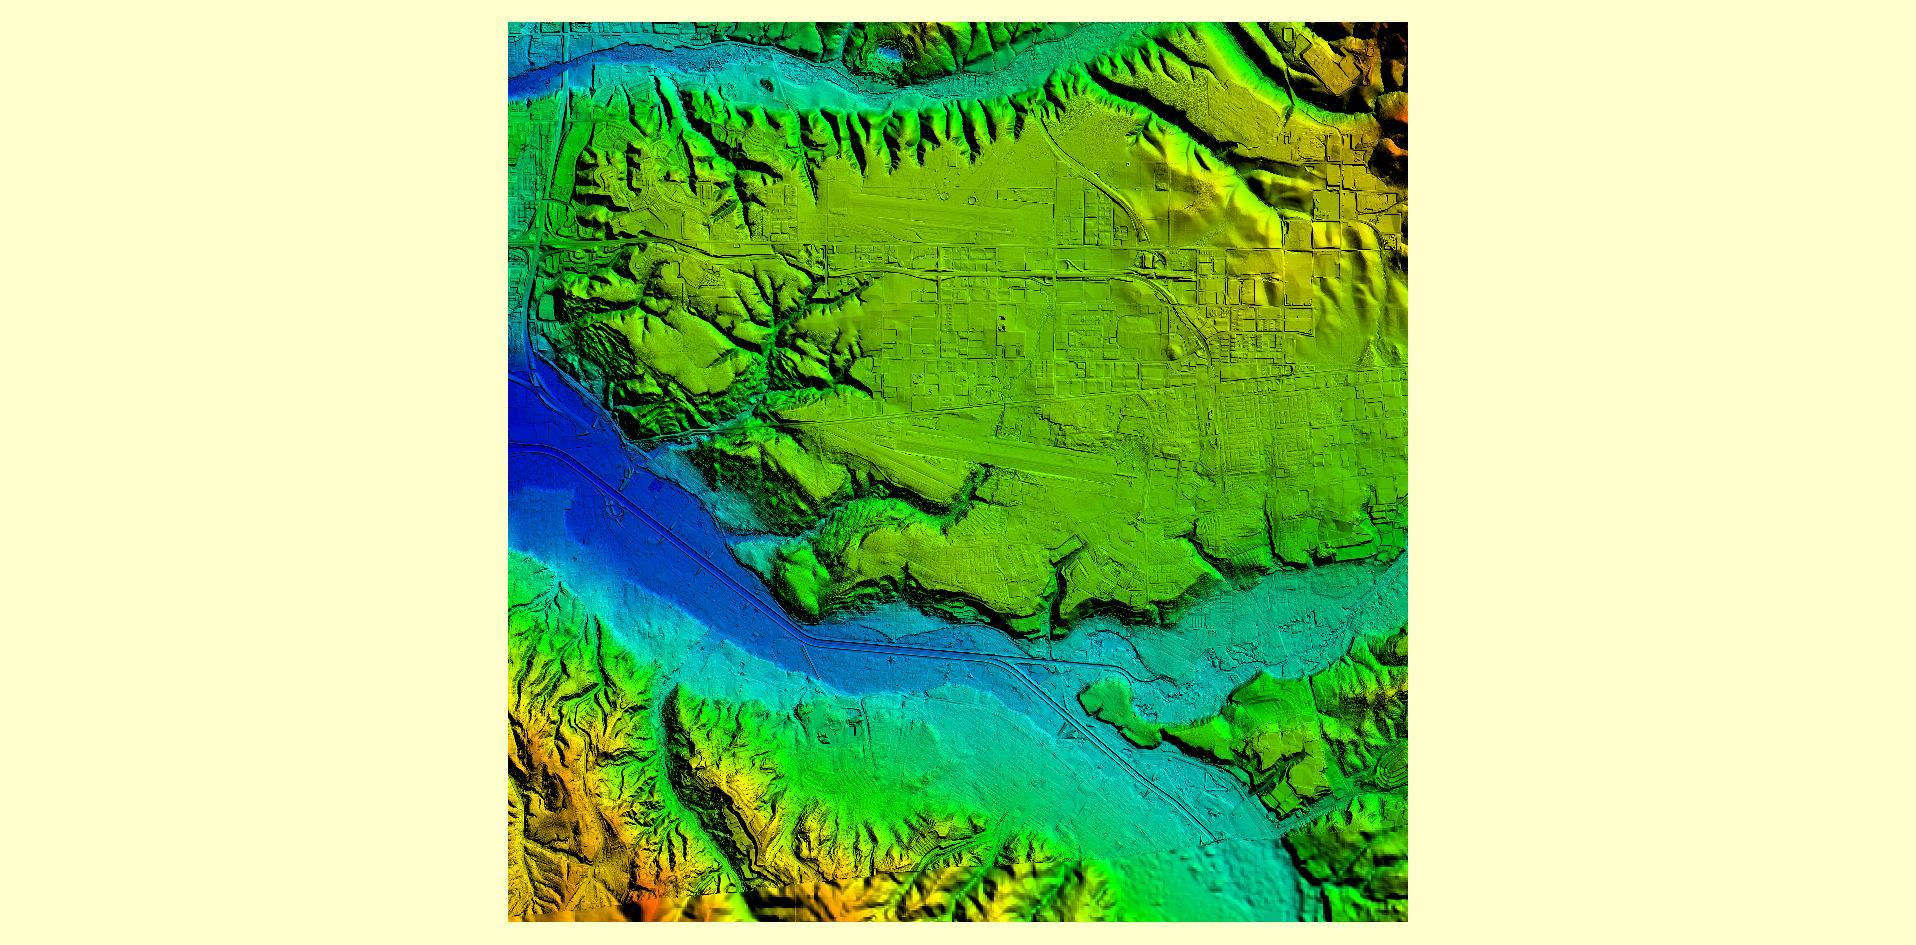 esri-global-terrain-dem_mmtj-gm_hillshader_screenshot-1-jpg.66229